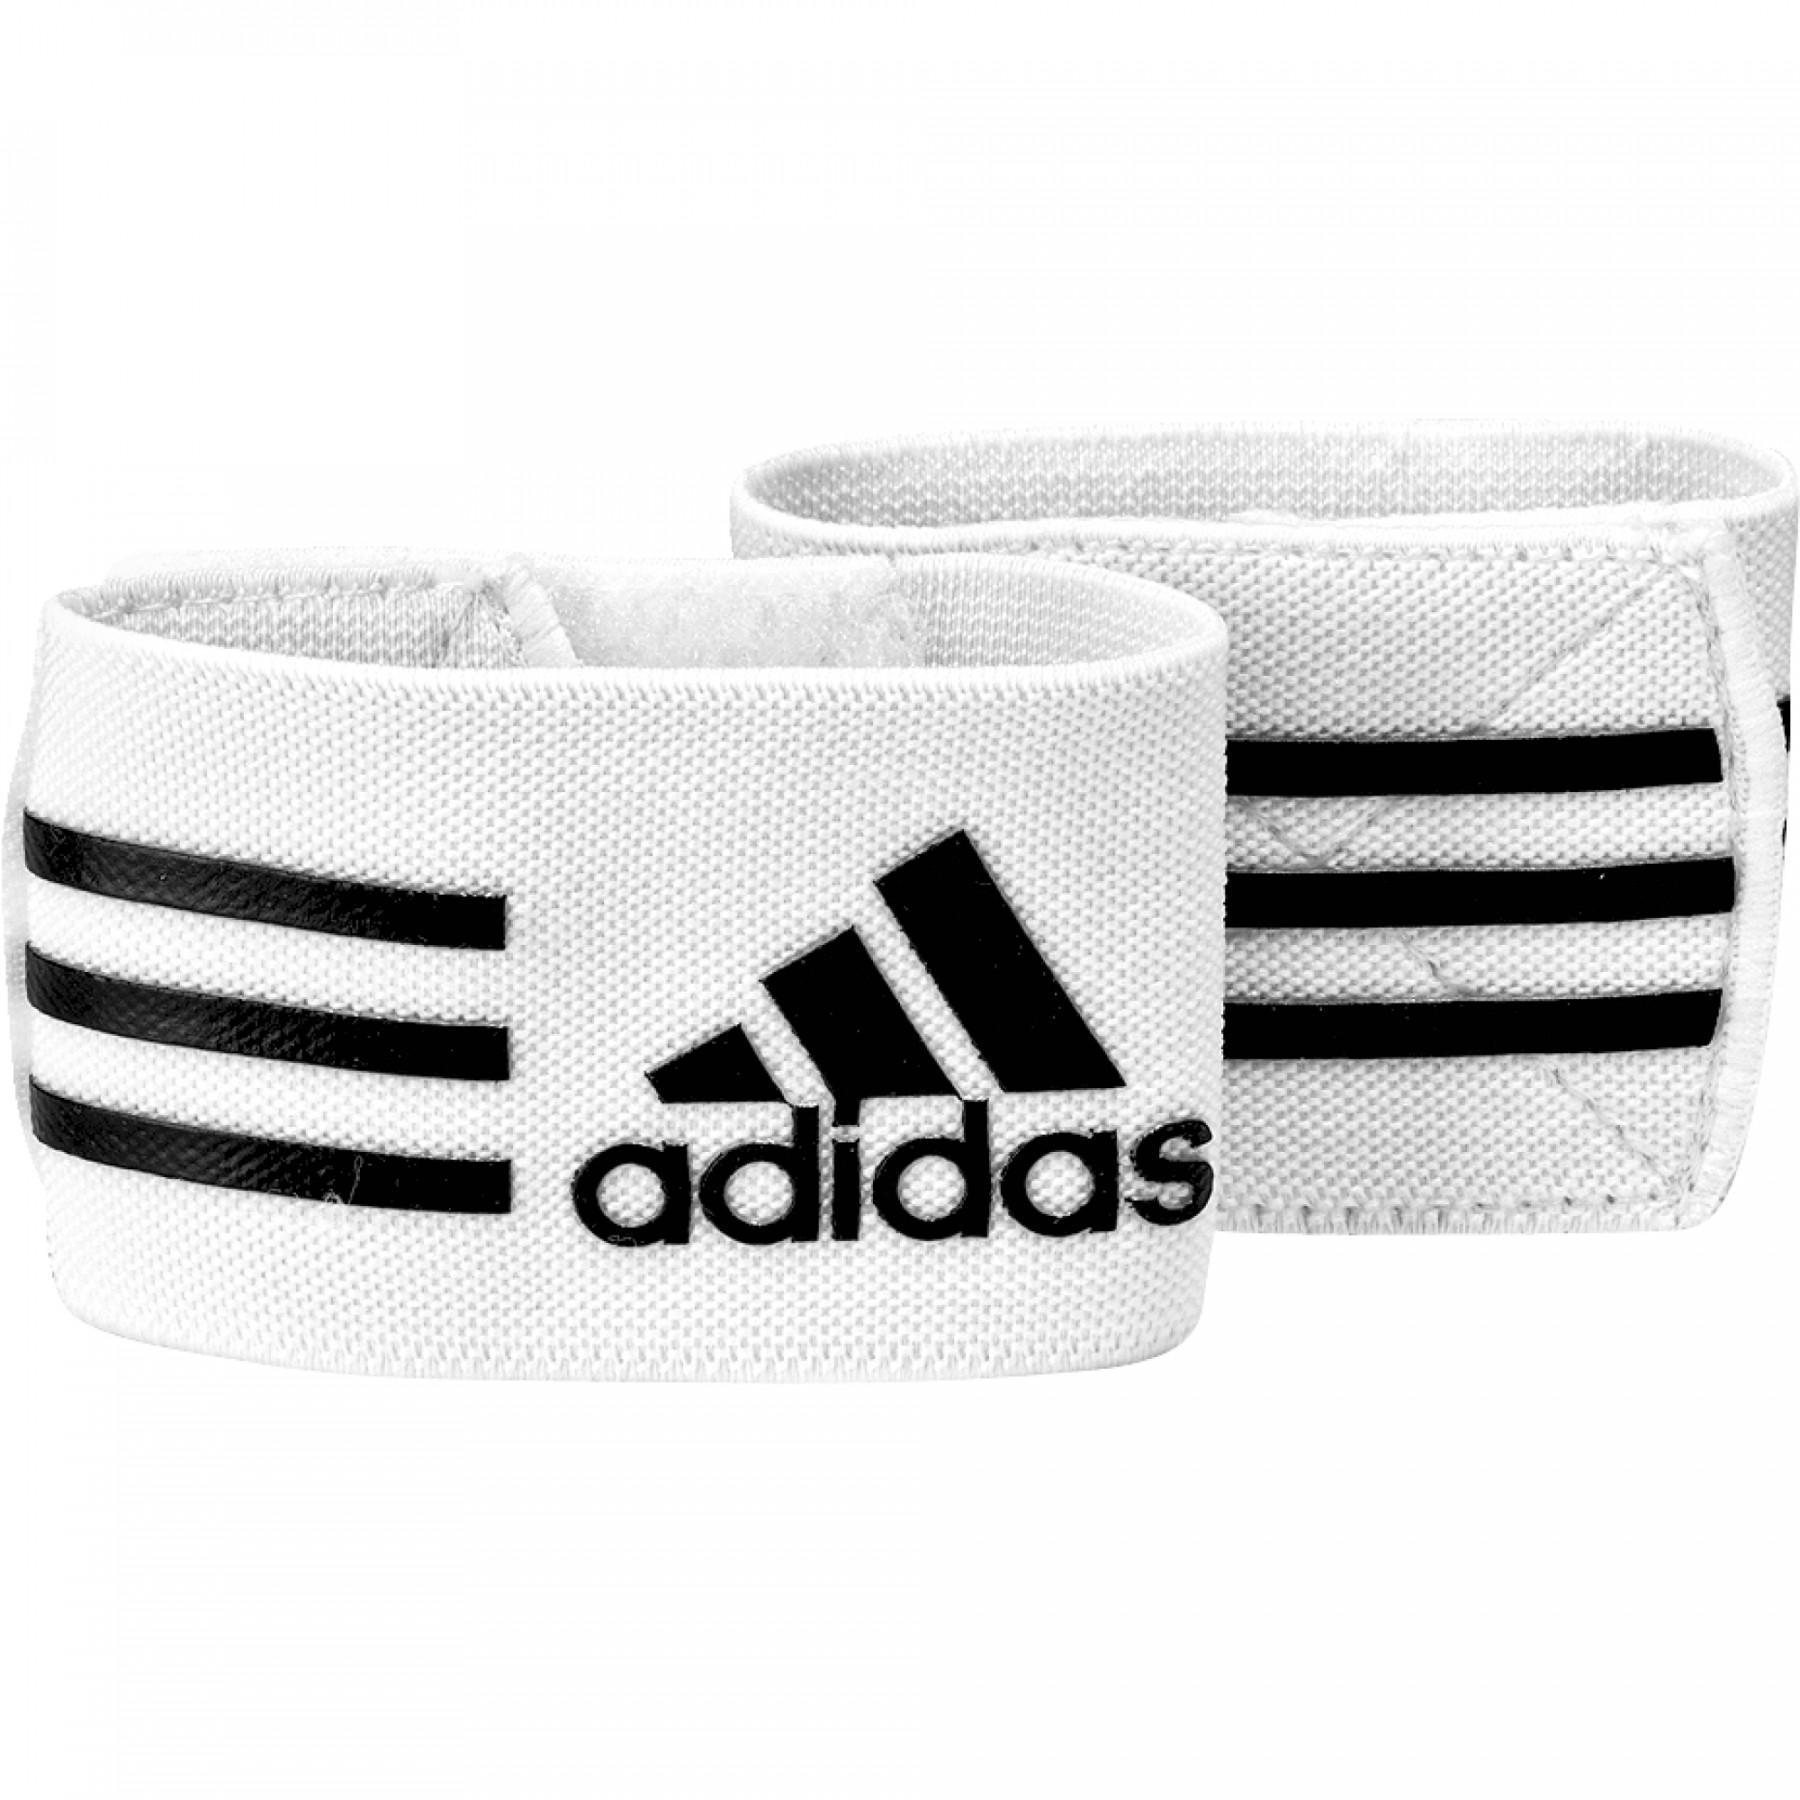 Sock holder adidas